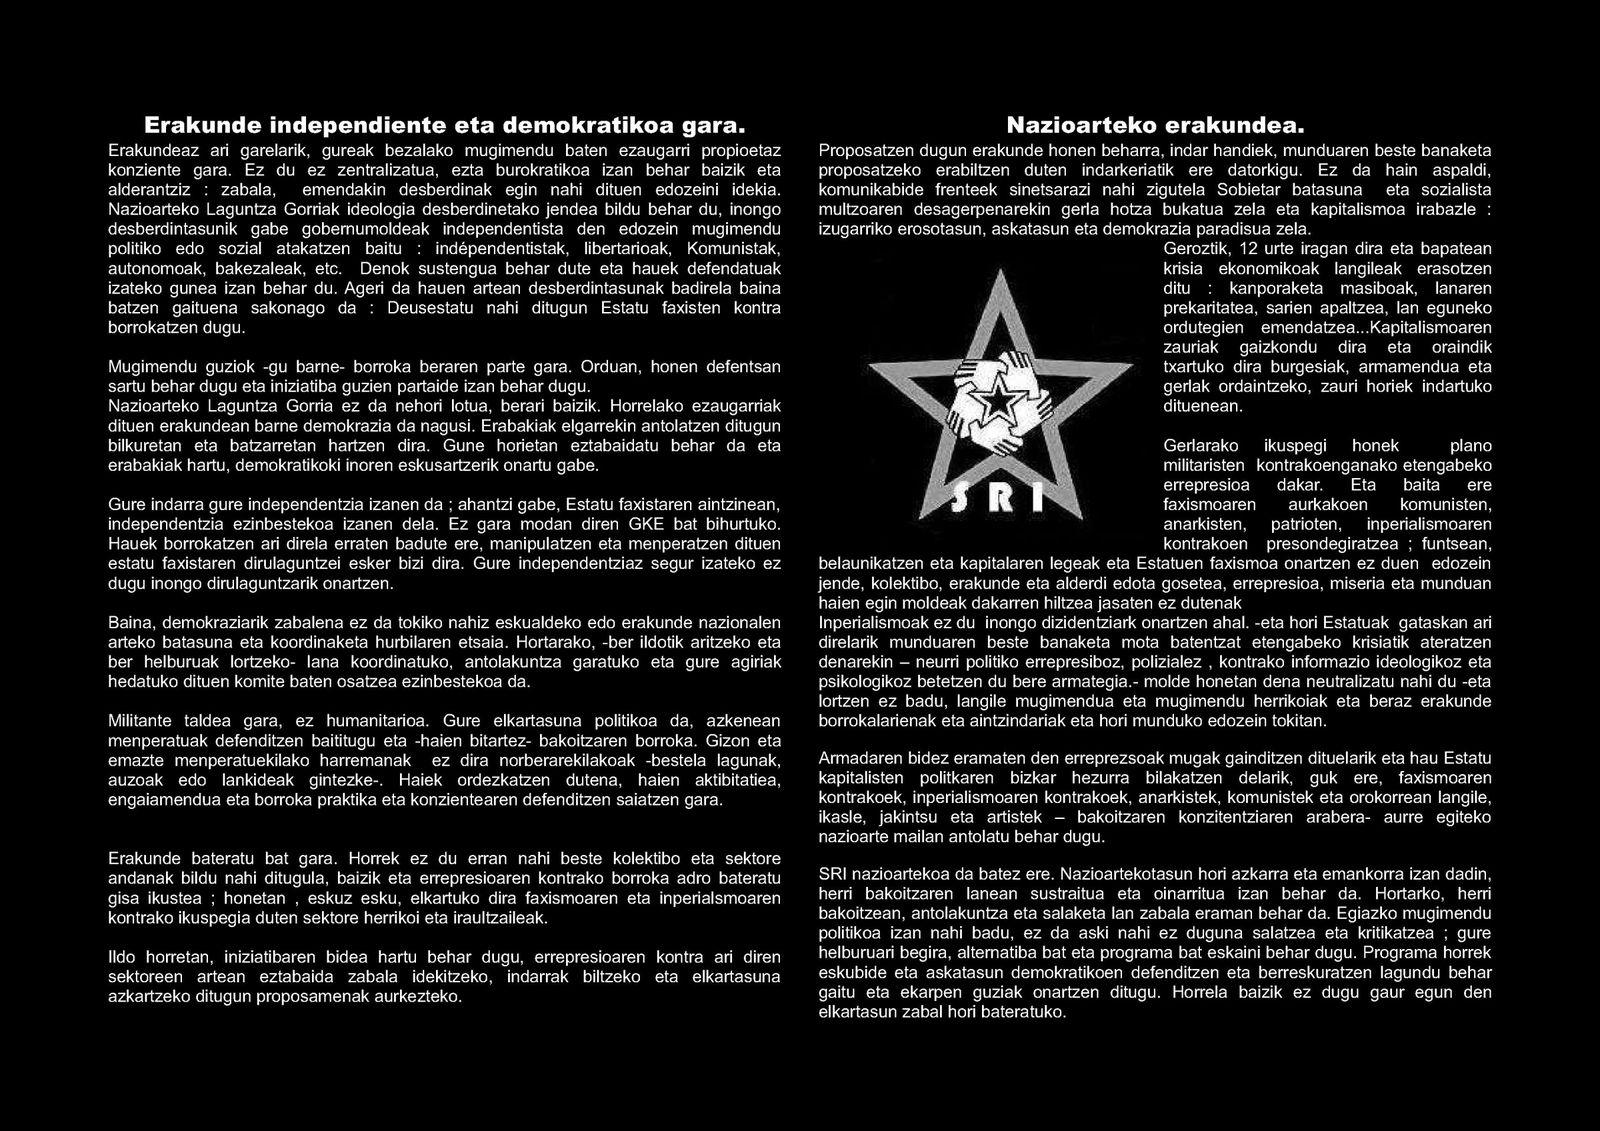 Socorro Rojo Internacional - SRI -  3-ITZULPEN-SRI